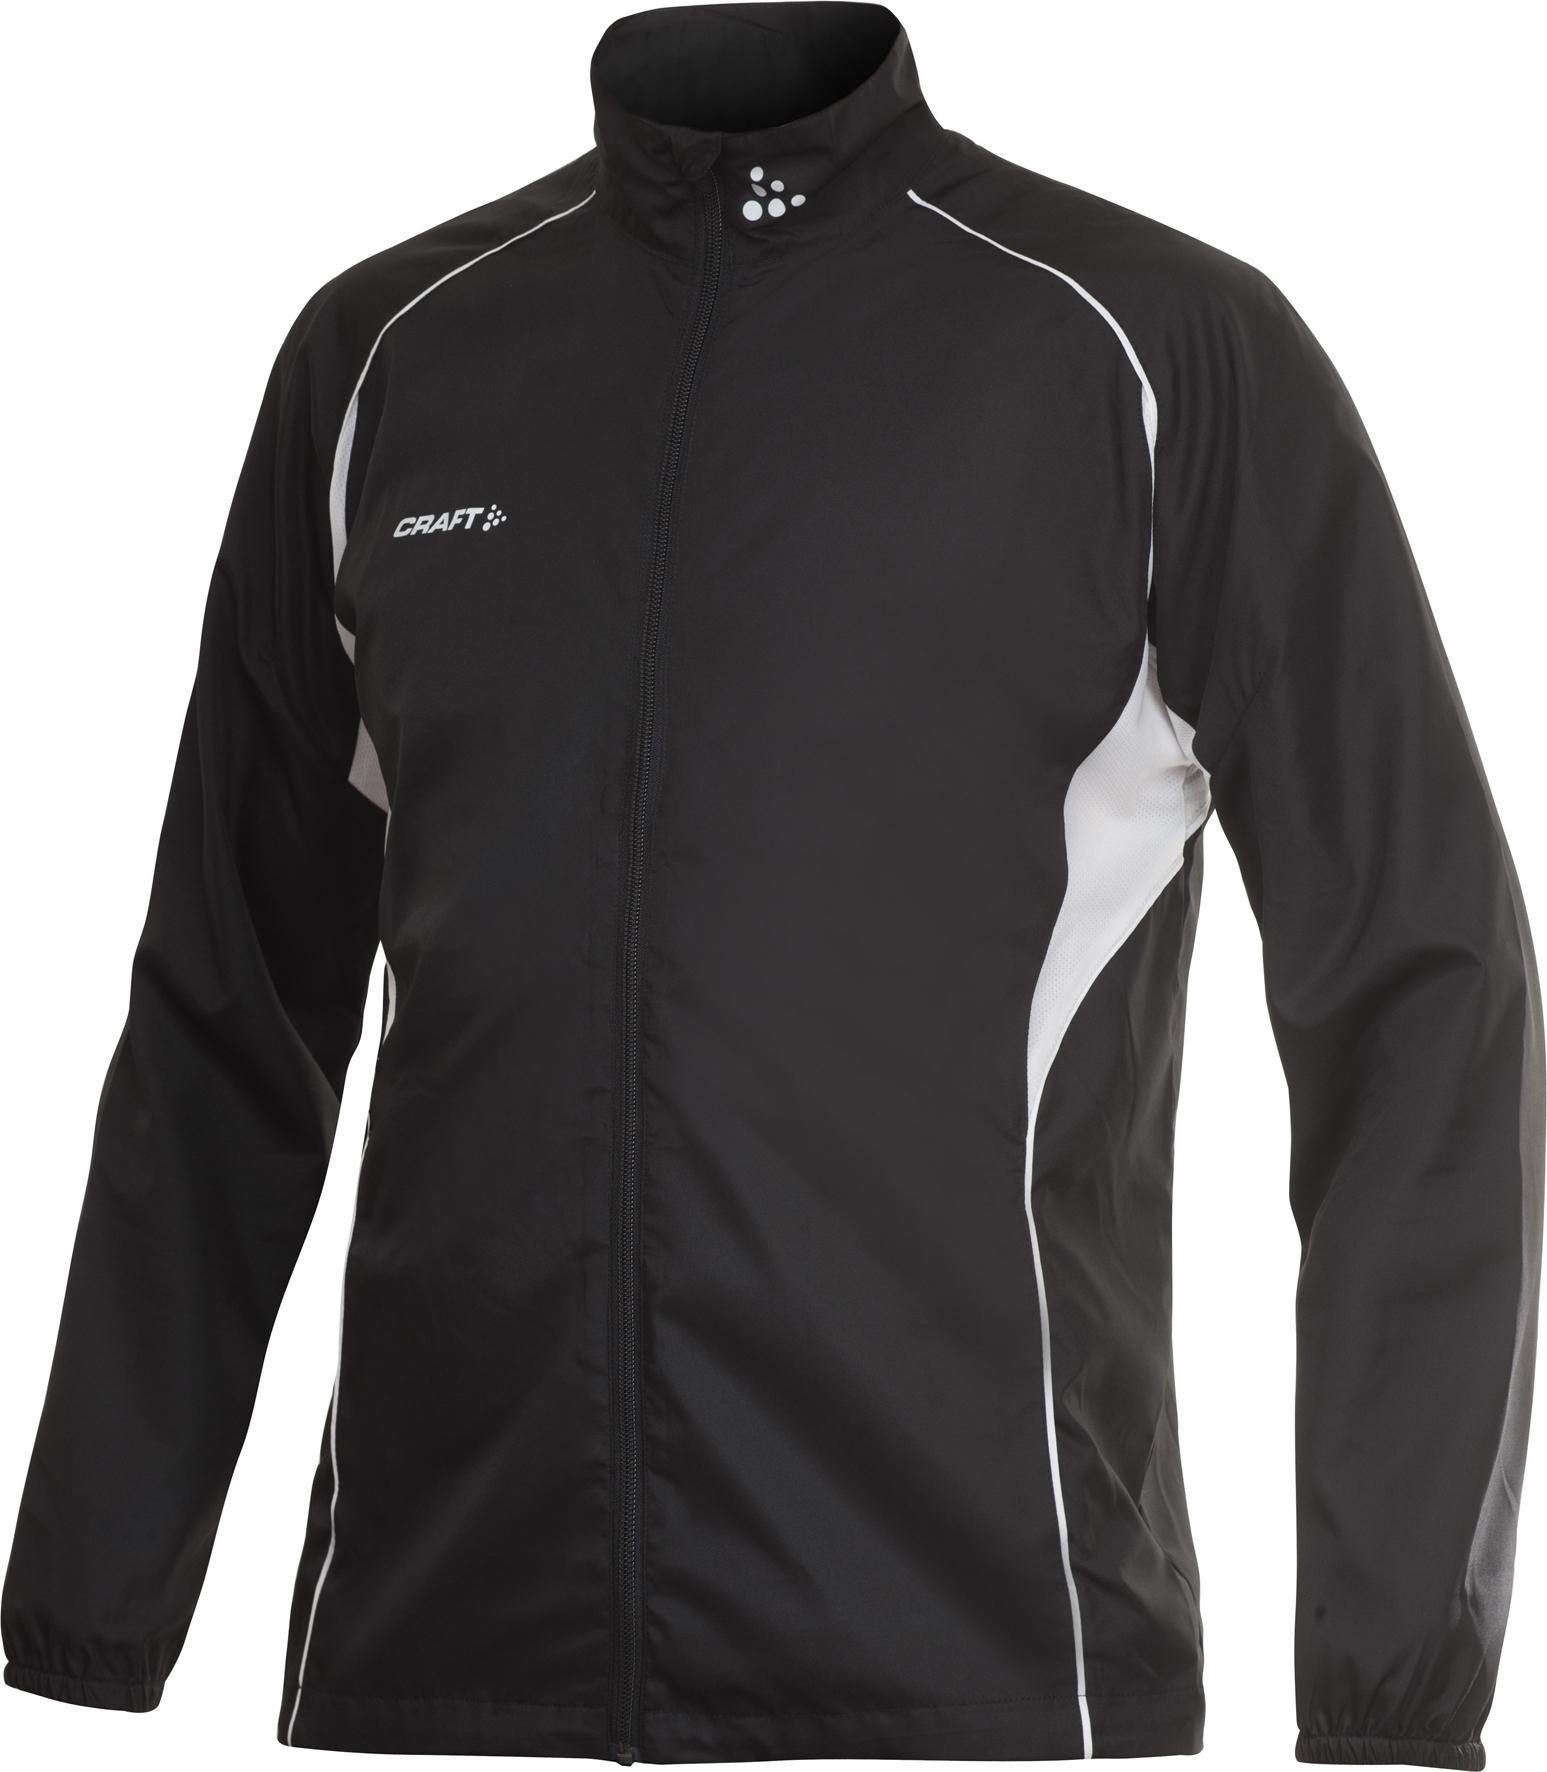 Куртка Craft Track and Field мужская черная  (1901239-2999)